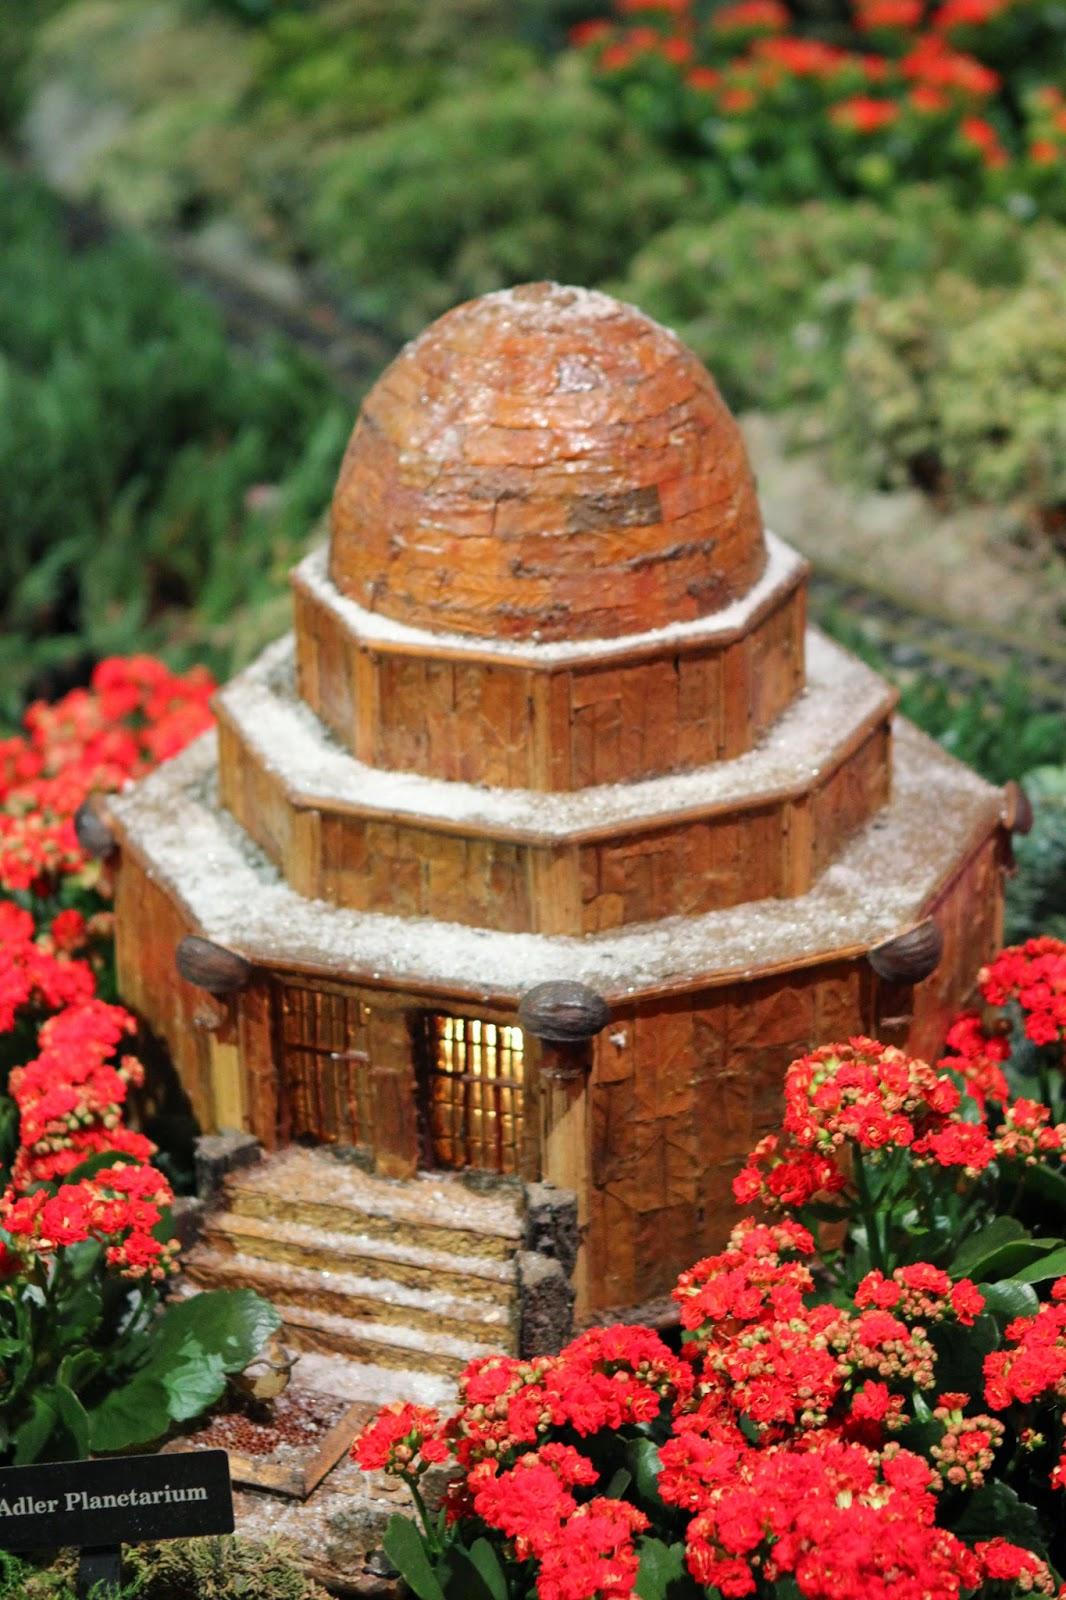 John Brookes My Chicago Botanic Garden